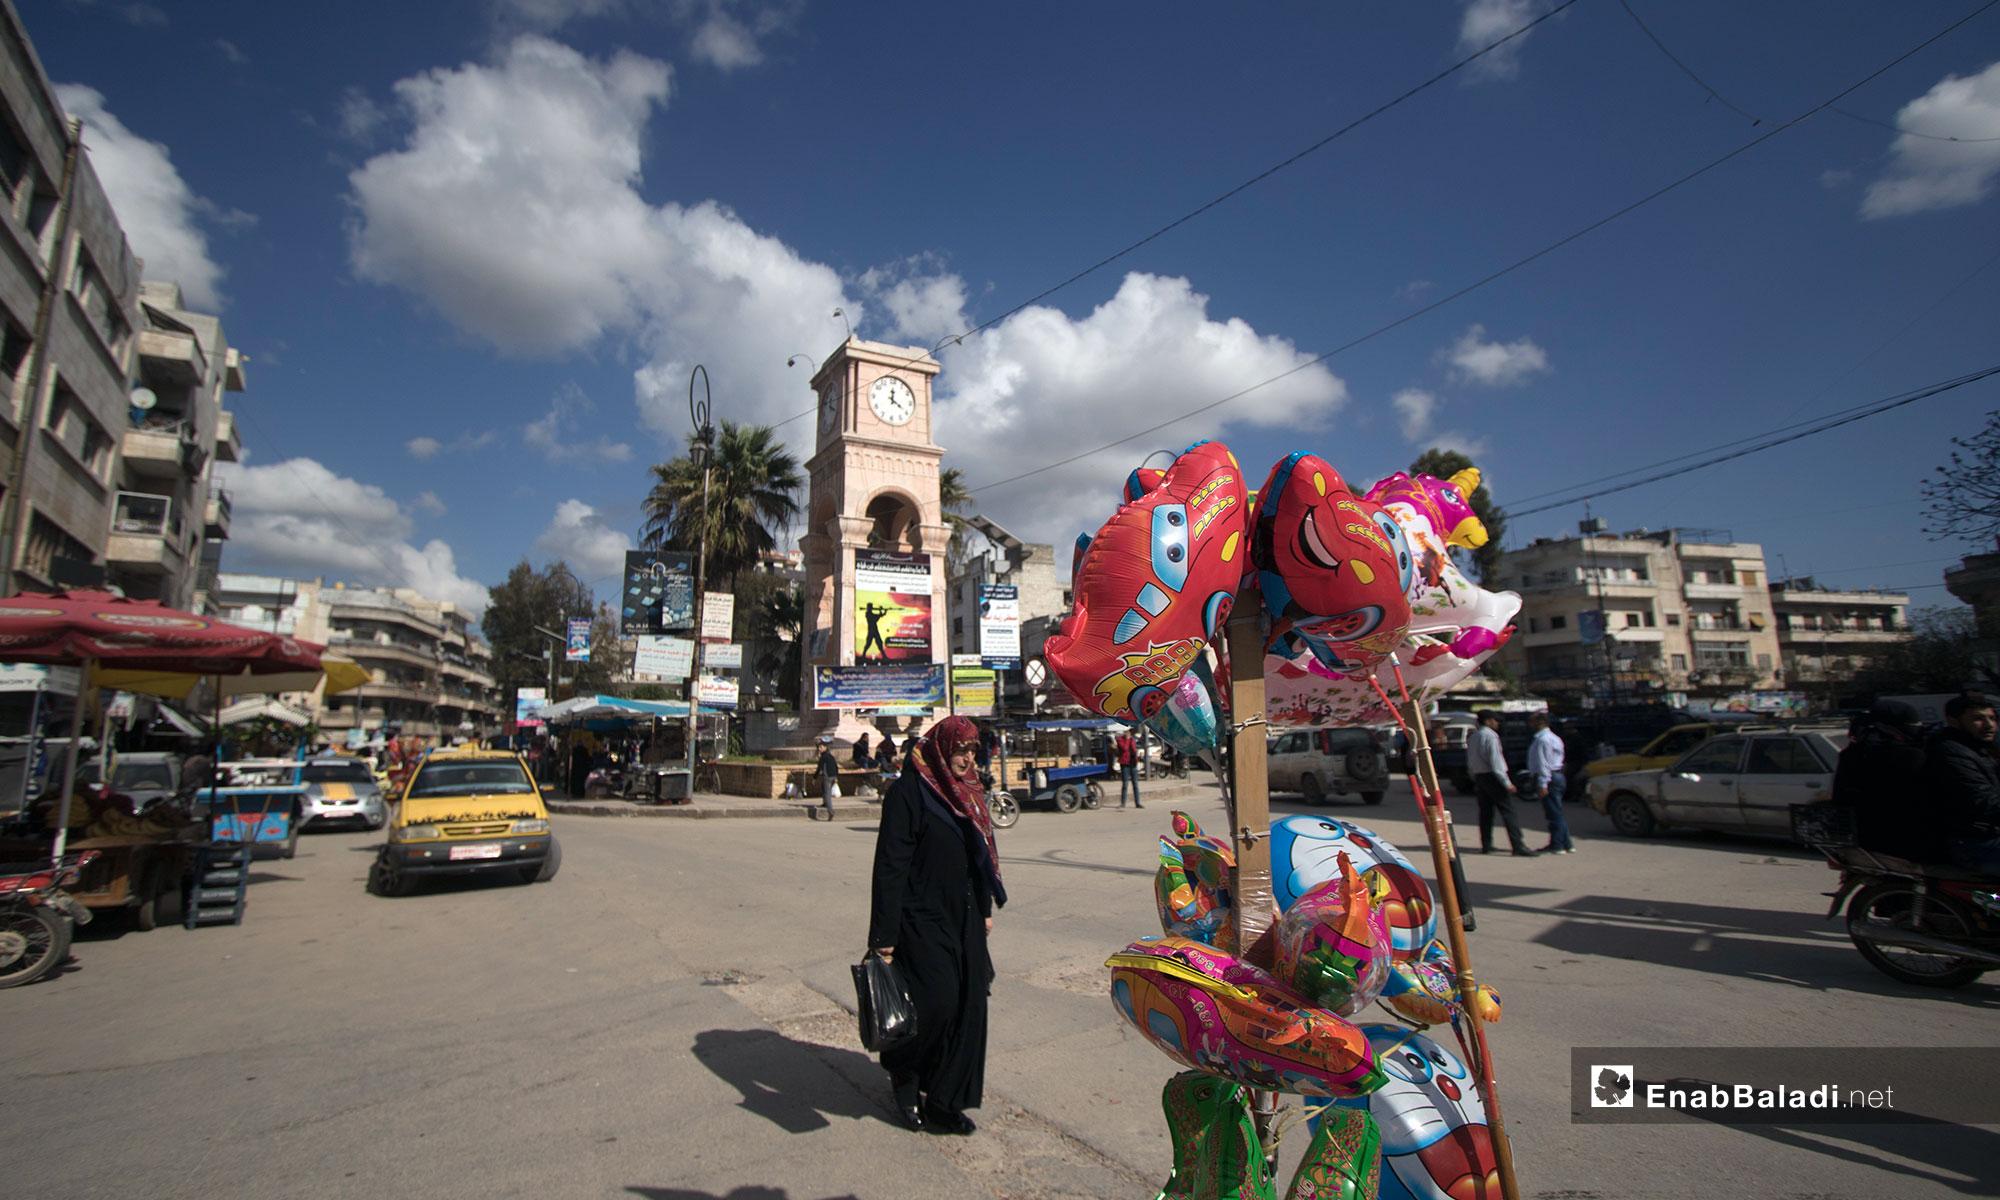 The markets of Idlib city – April 10, 2019 (Enab Baladi)